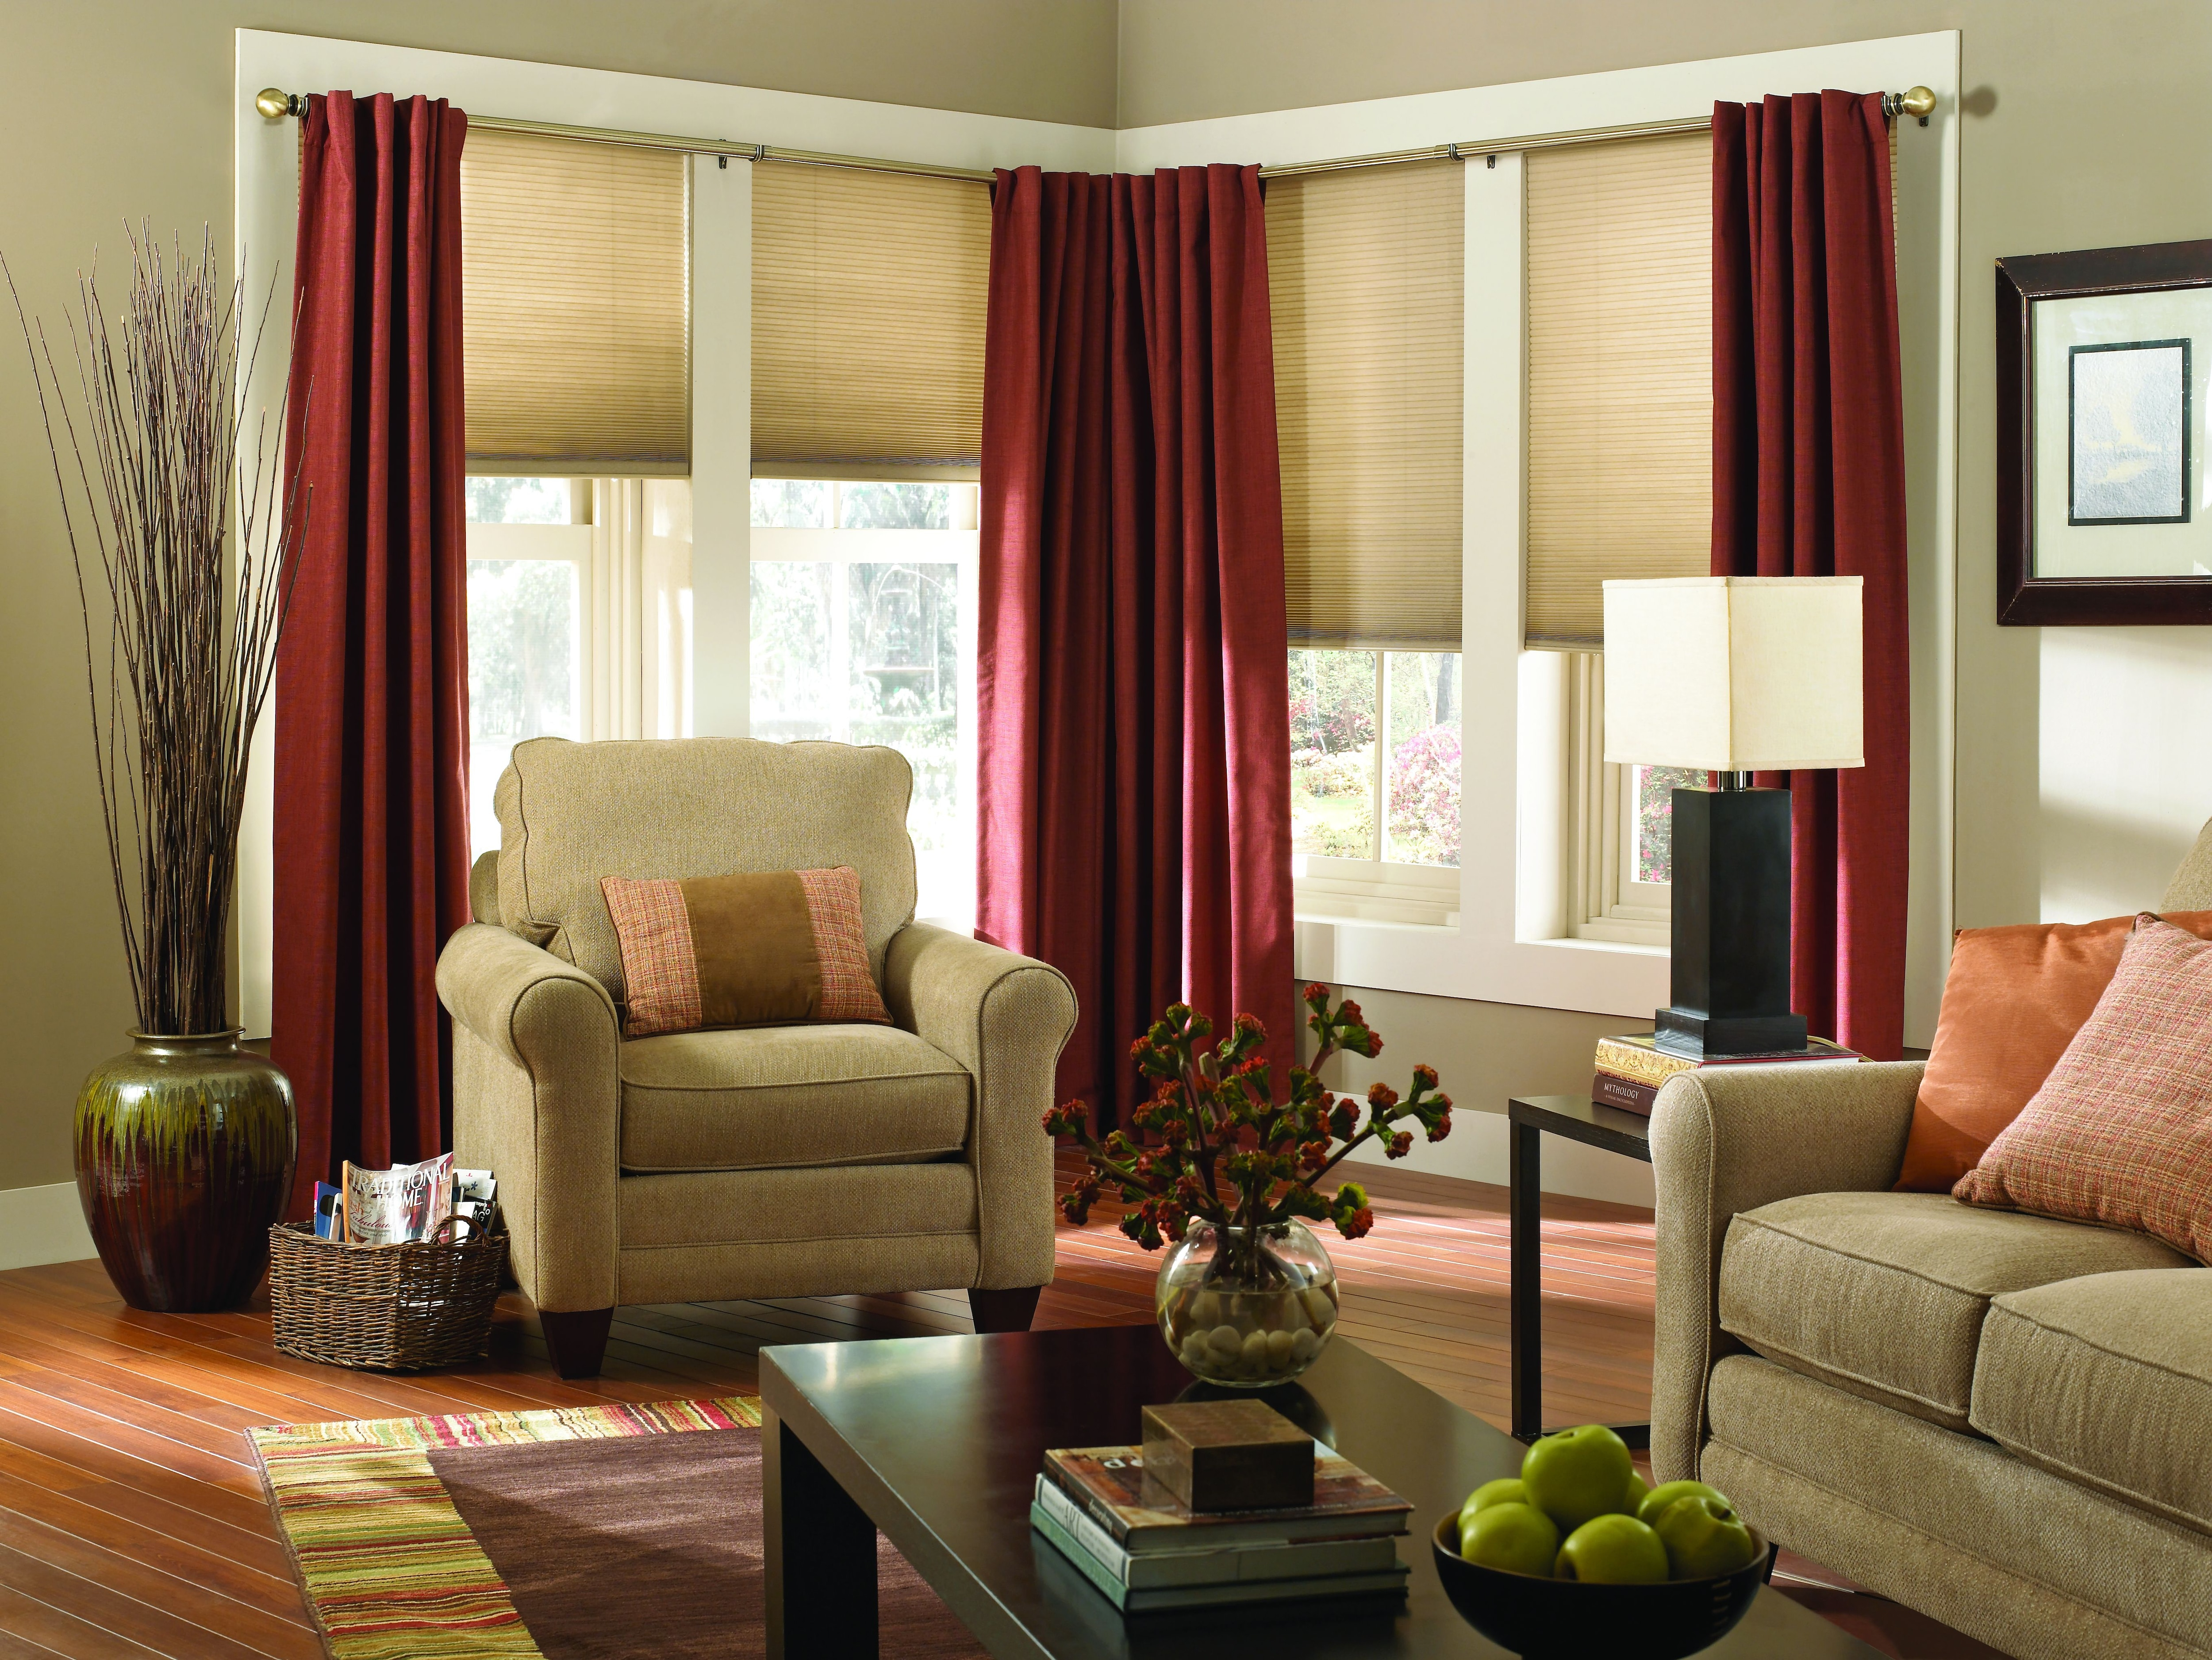 luna window venetian treatments co reviews blind importing cordless achim blinds pdx wayfair